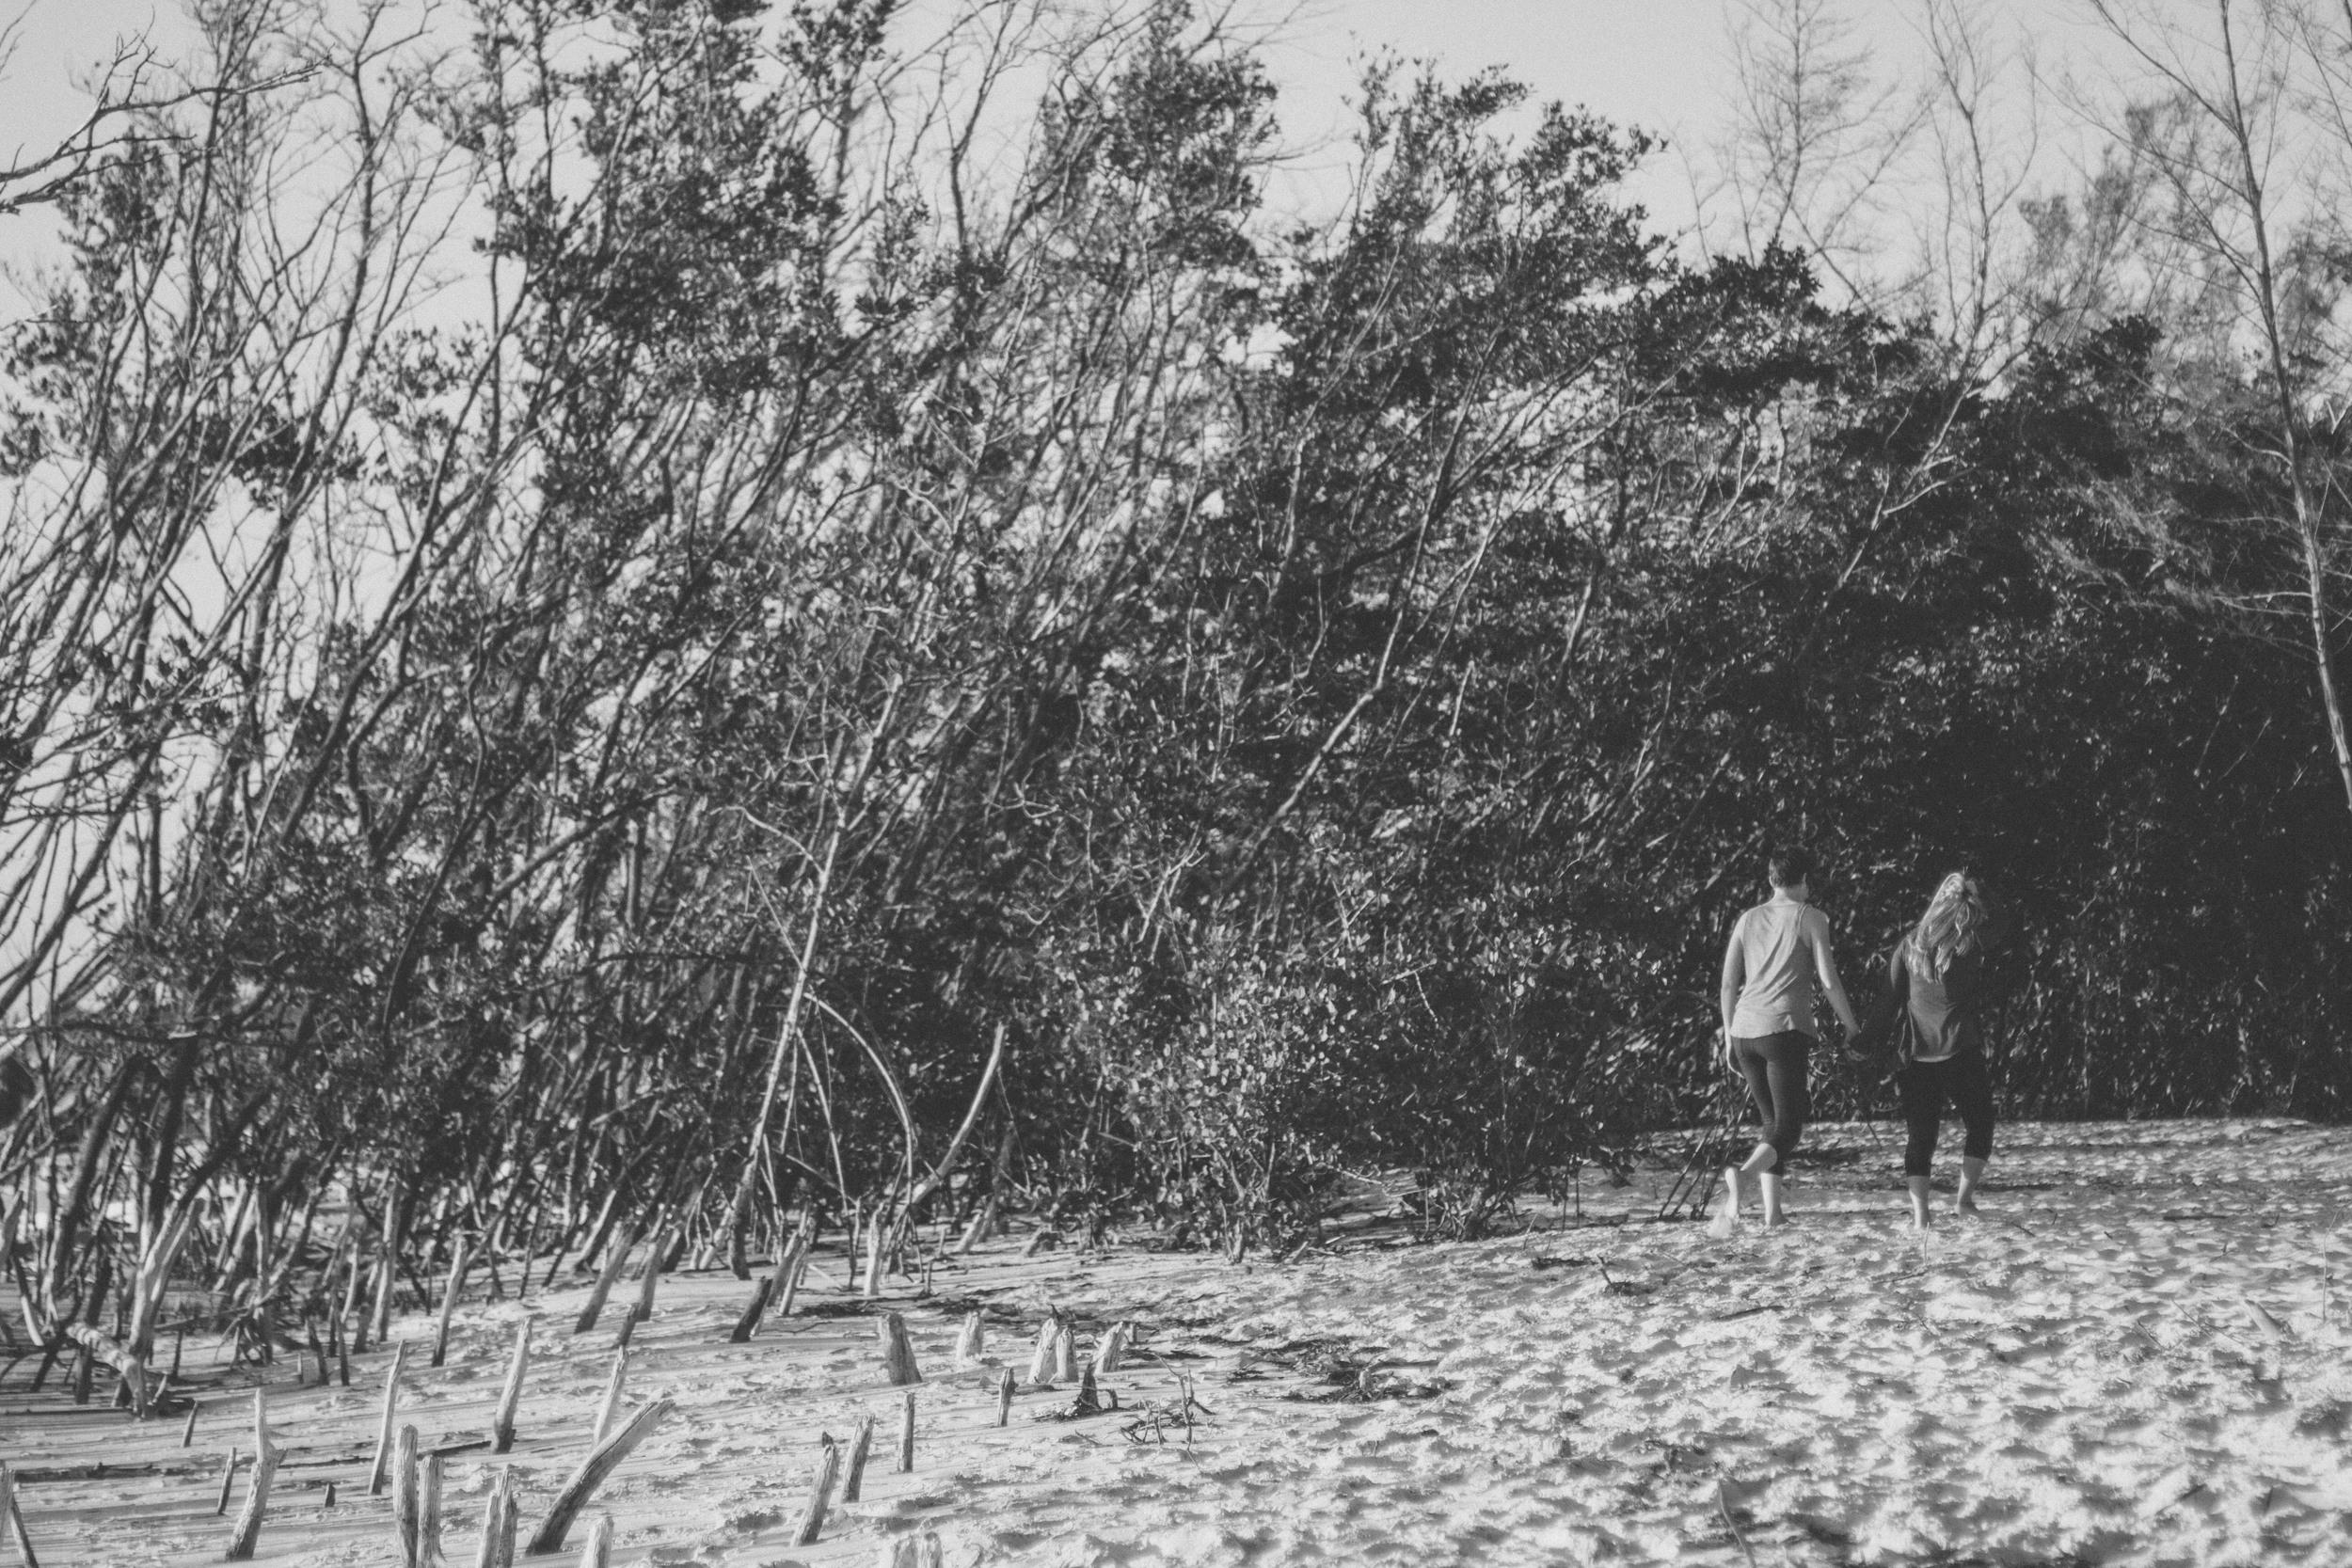 FLORIDA PART II // JULIA & CASSIE // THE ETERNAL CHILD